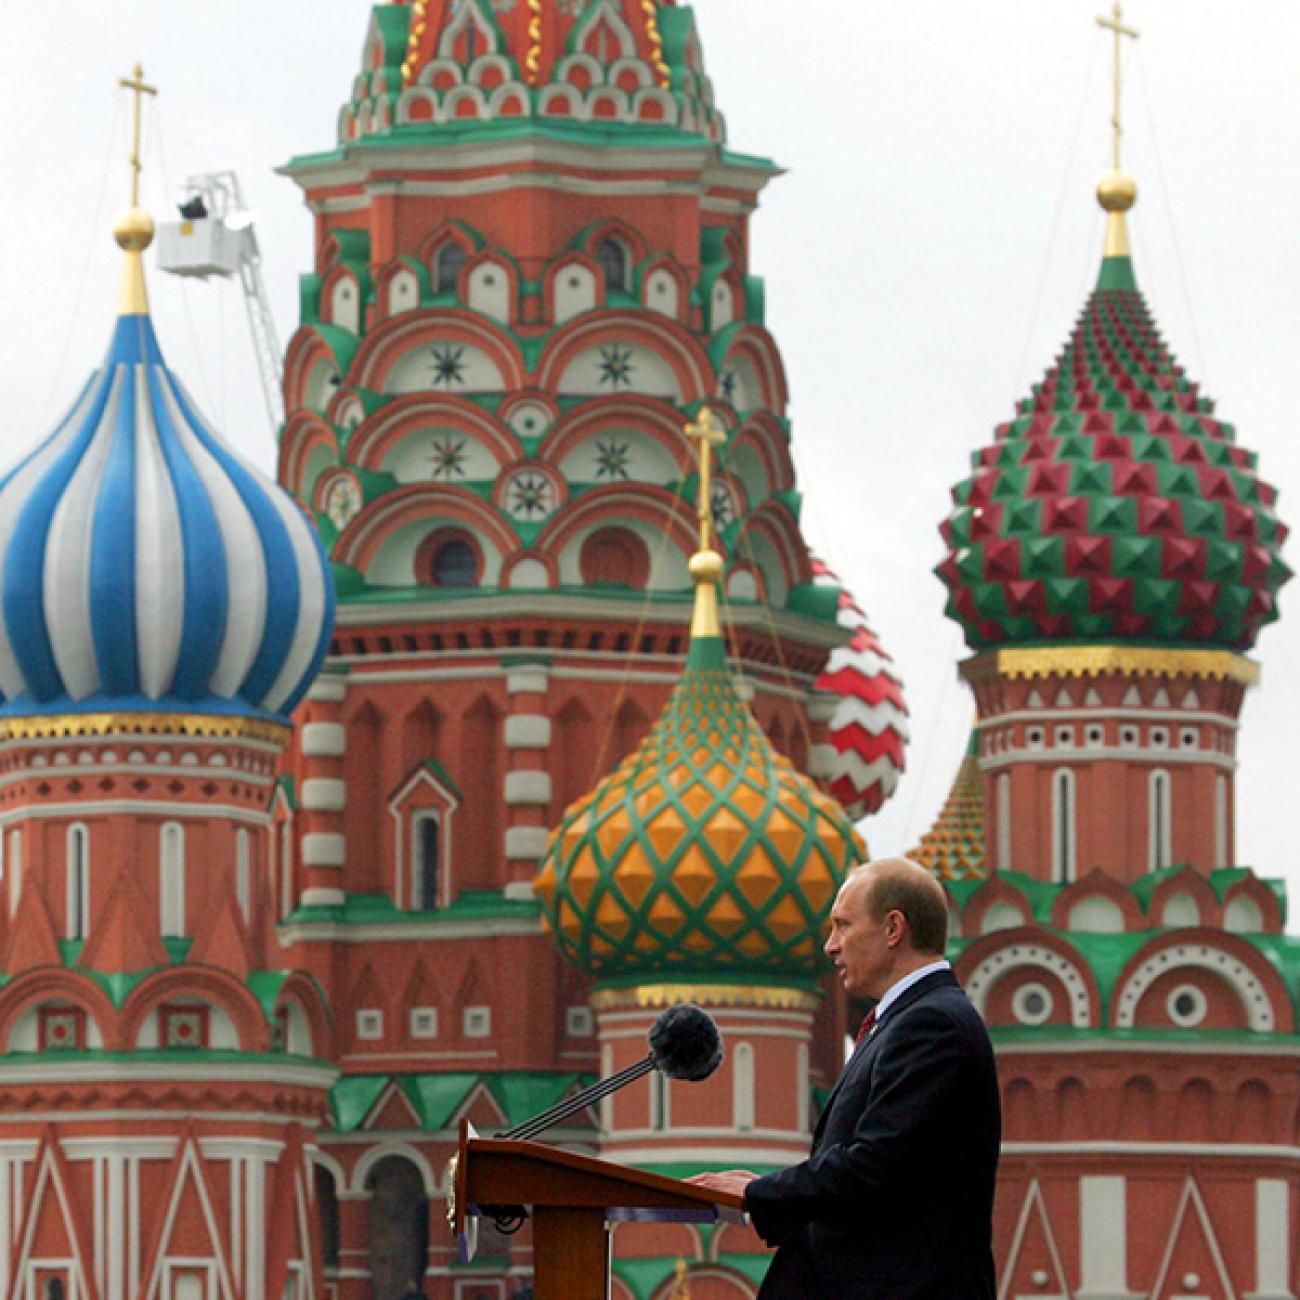 https://www.thinkglobalhealth.org/sites/default/files/styles/max_1300x1300_1_1/public/2020-06/Twigg-CoV-Russia-6.4.20-RTXNGJC-SQUARE.jpg?itok=ZYO-phSc